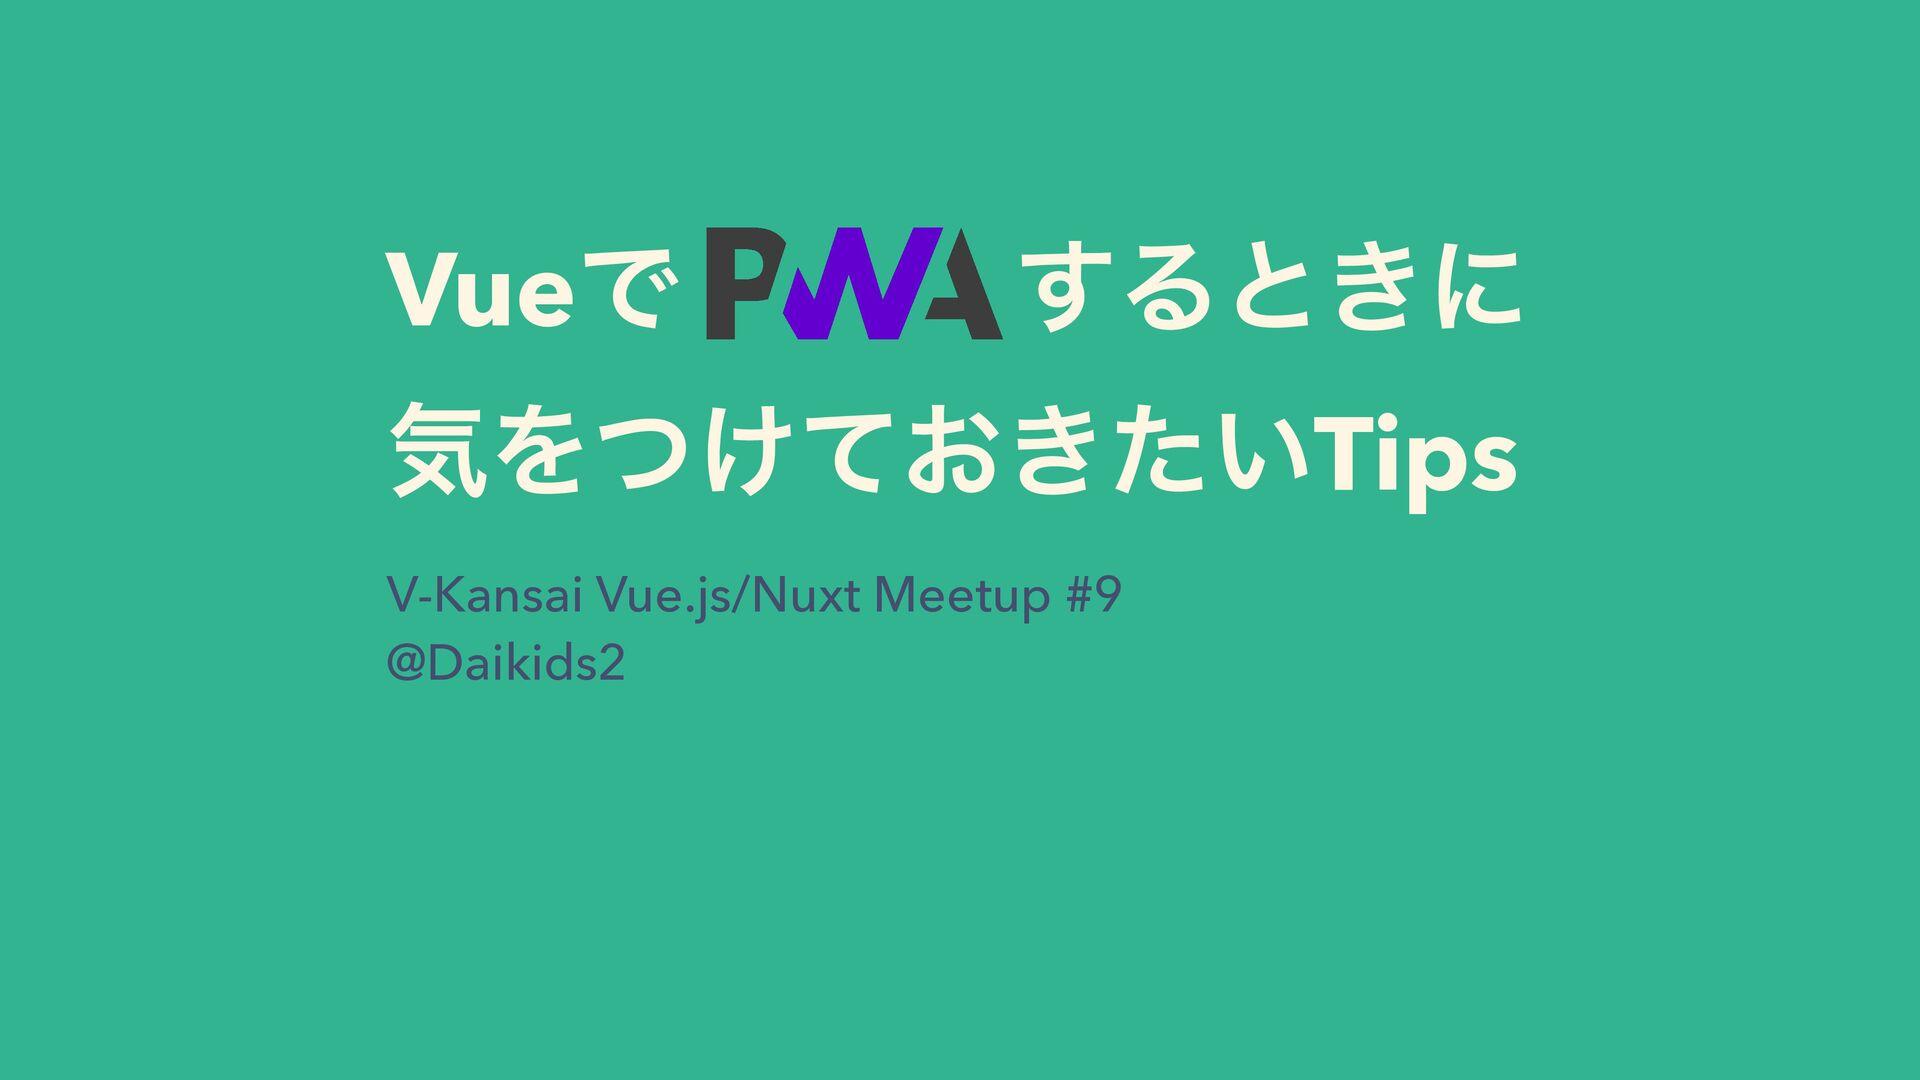 VueͰ ͢Δͱ͖ʹ ؾΛ͚͓͖͍ͭͯͨTips V-Kansai Vue.js/Nuxt M...